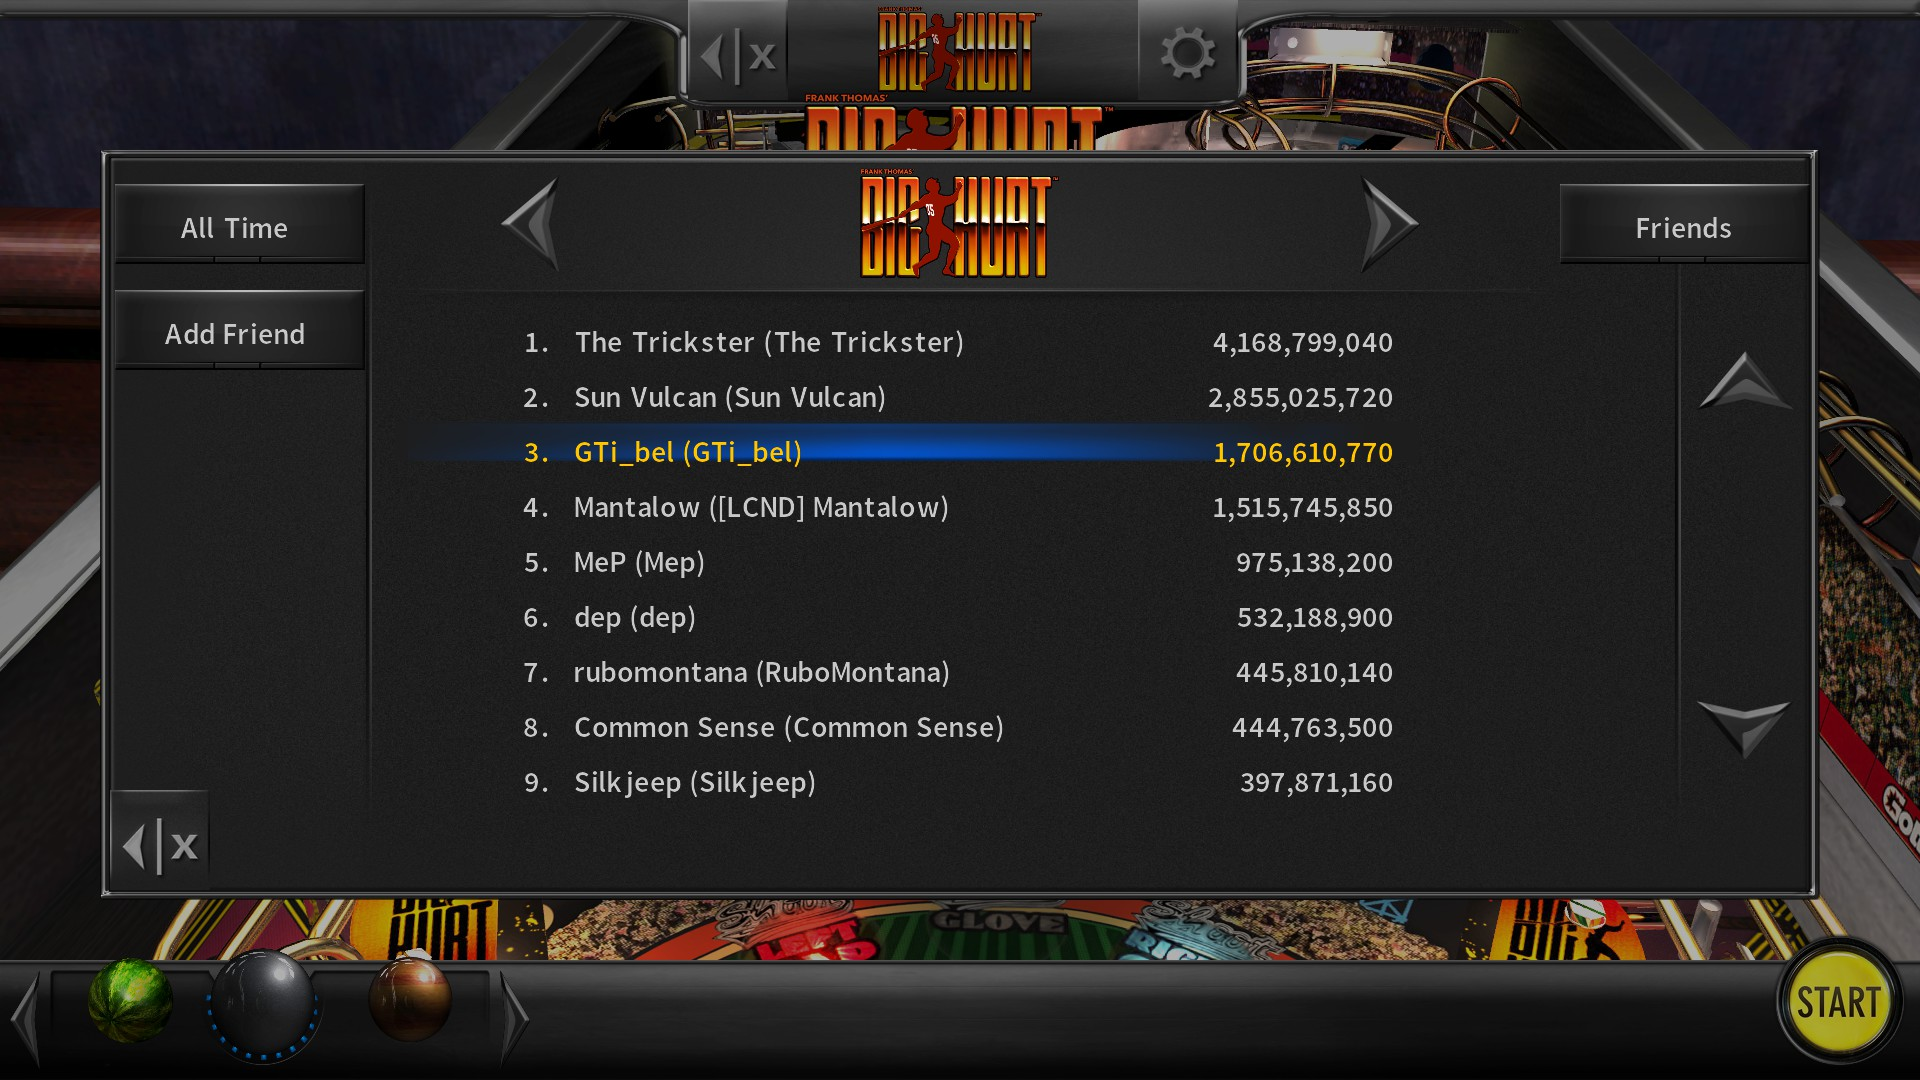 Pinball Arcade: Big Hurt 1,706,610,770 points